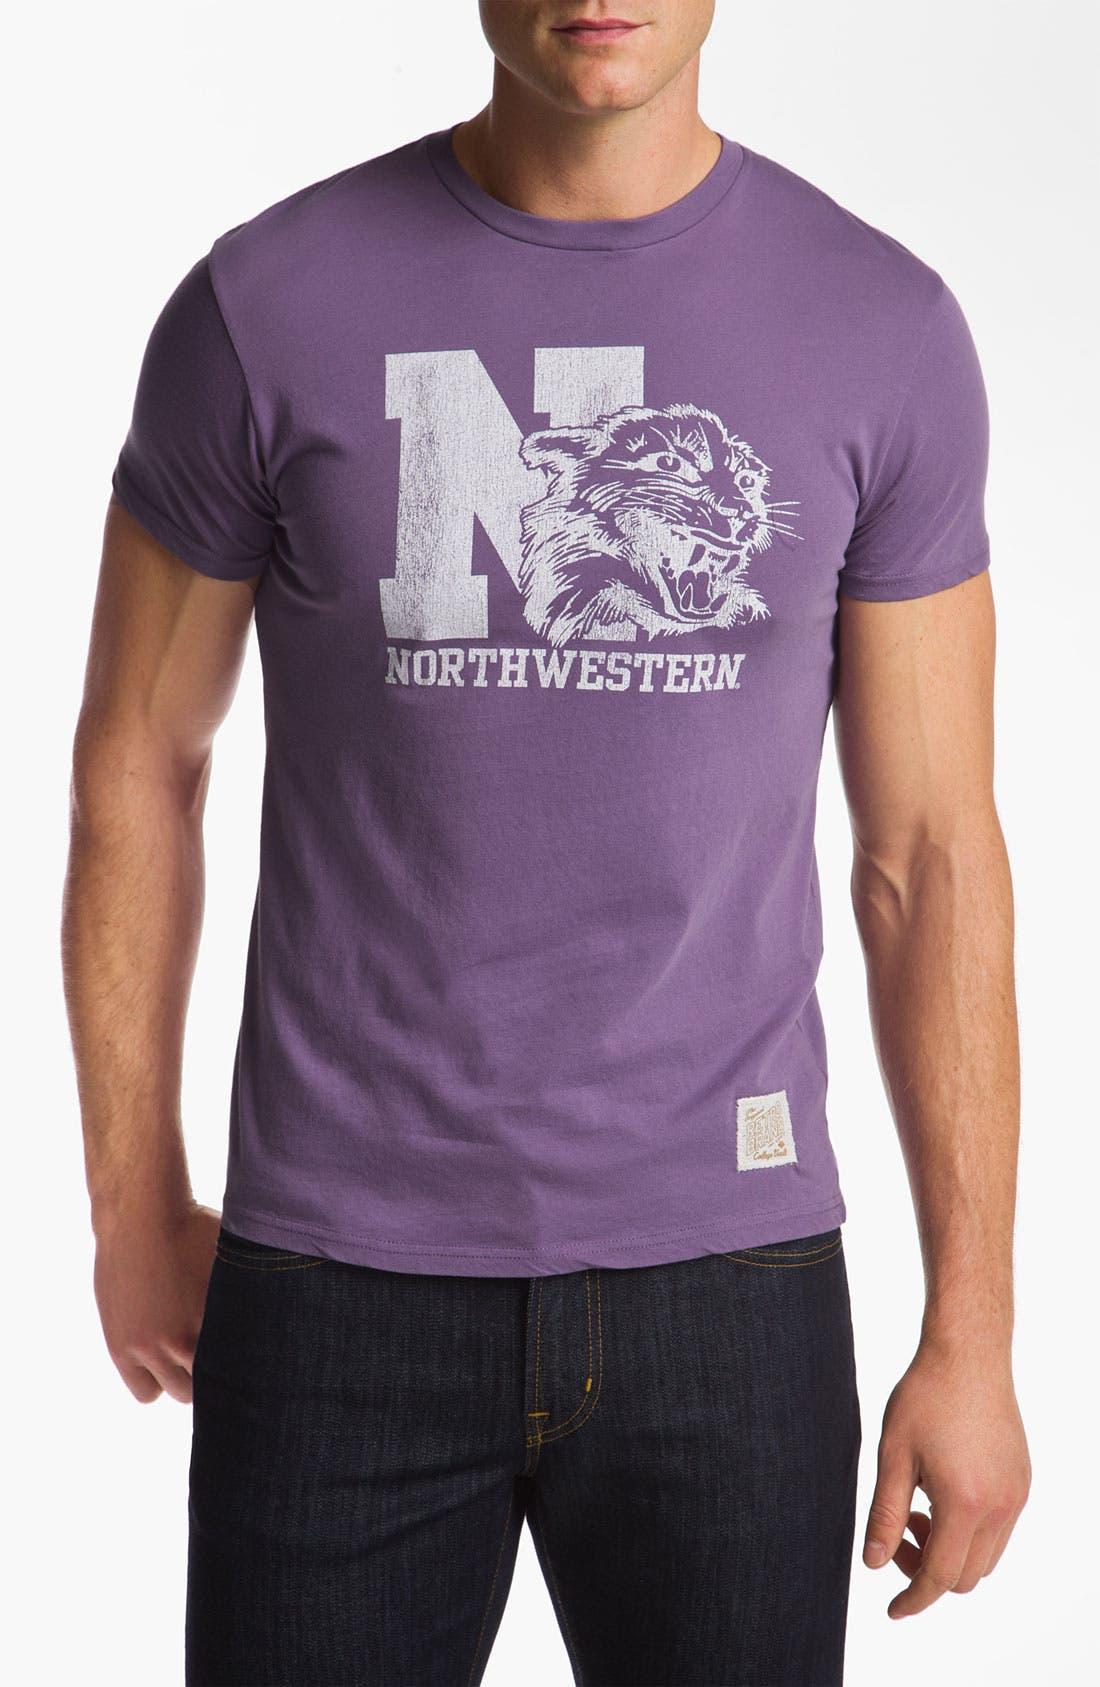 Alternate Image 1 Selected - The Original Retro Brand 'Northwestern Wildcats' T-Shirt